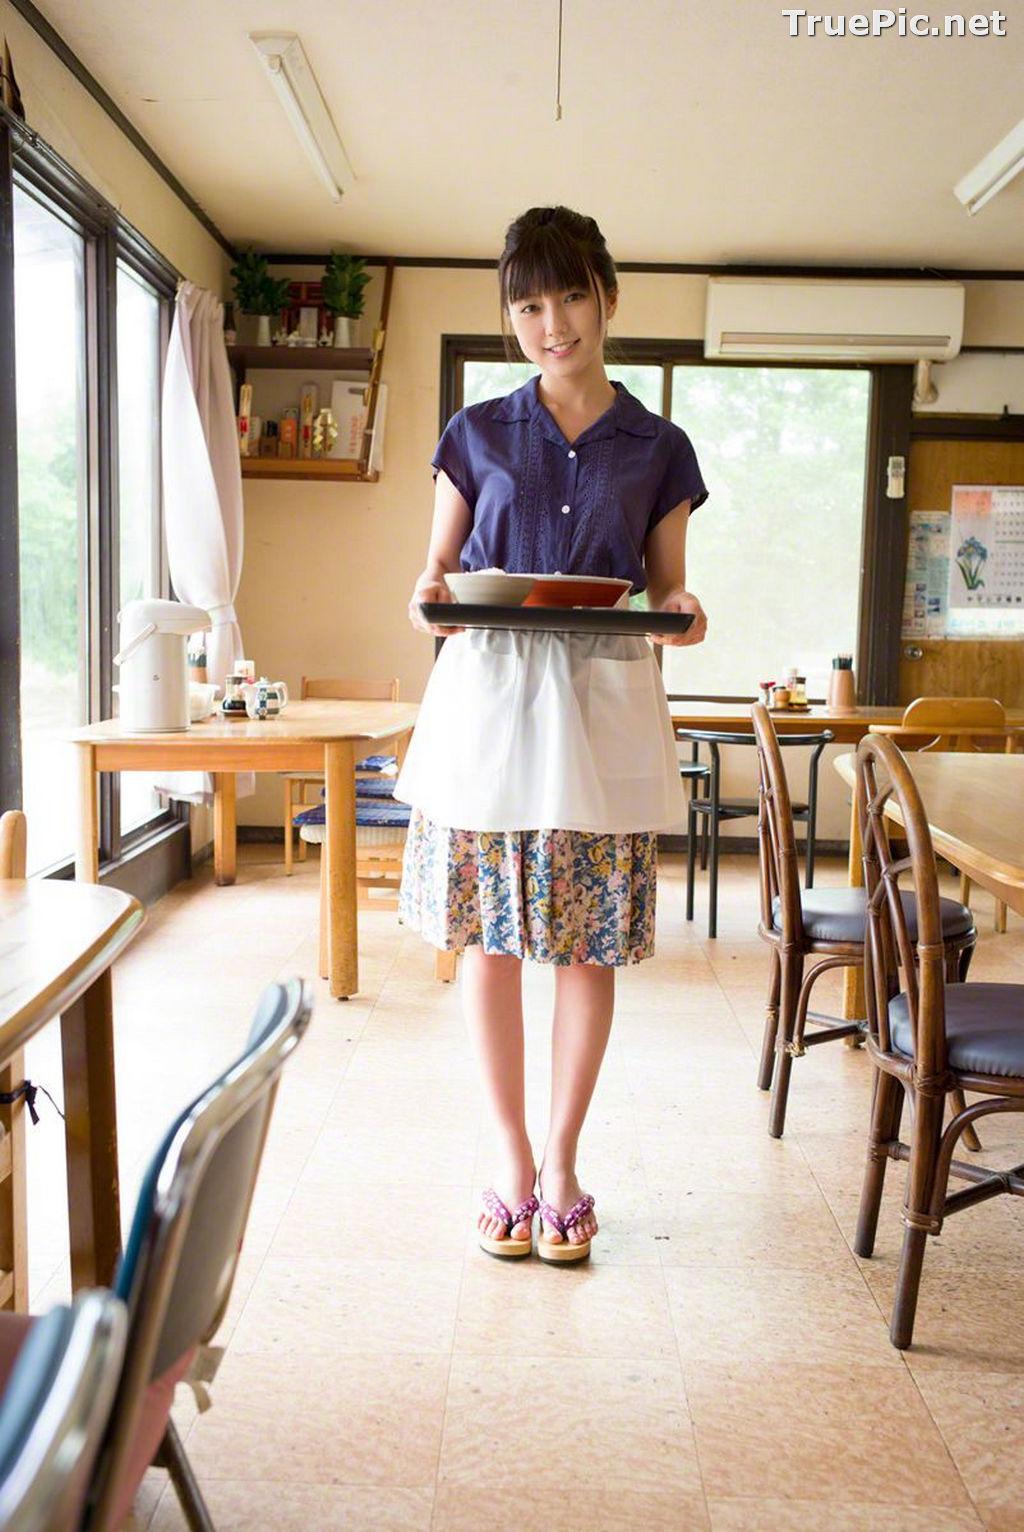 Image Wanibooks No.130 - Japanese Idol Singer and Actress - Erina Mano - TruePic.net - Picture-1